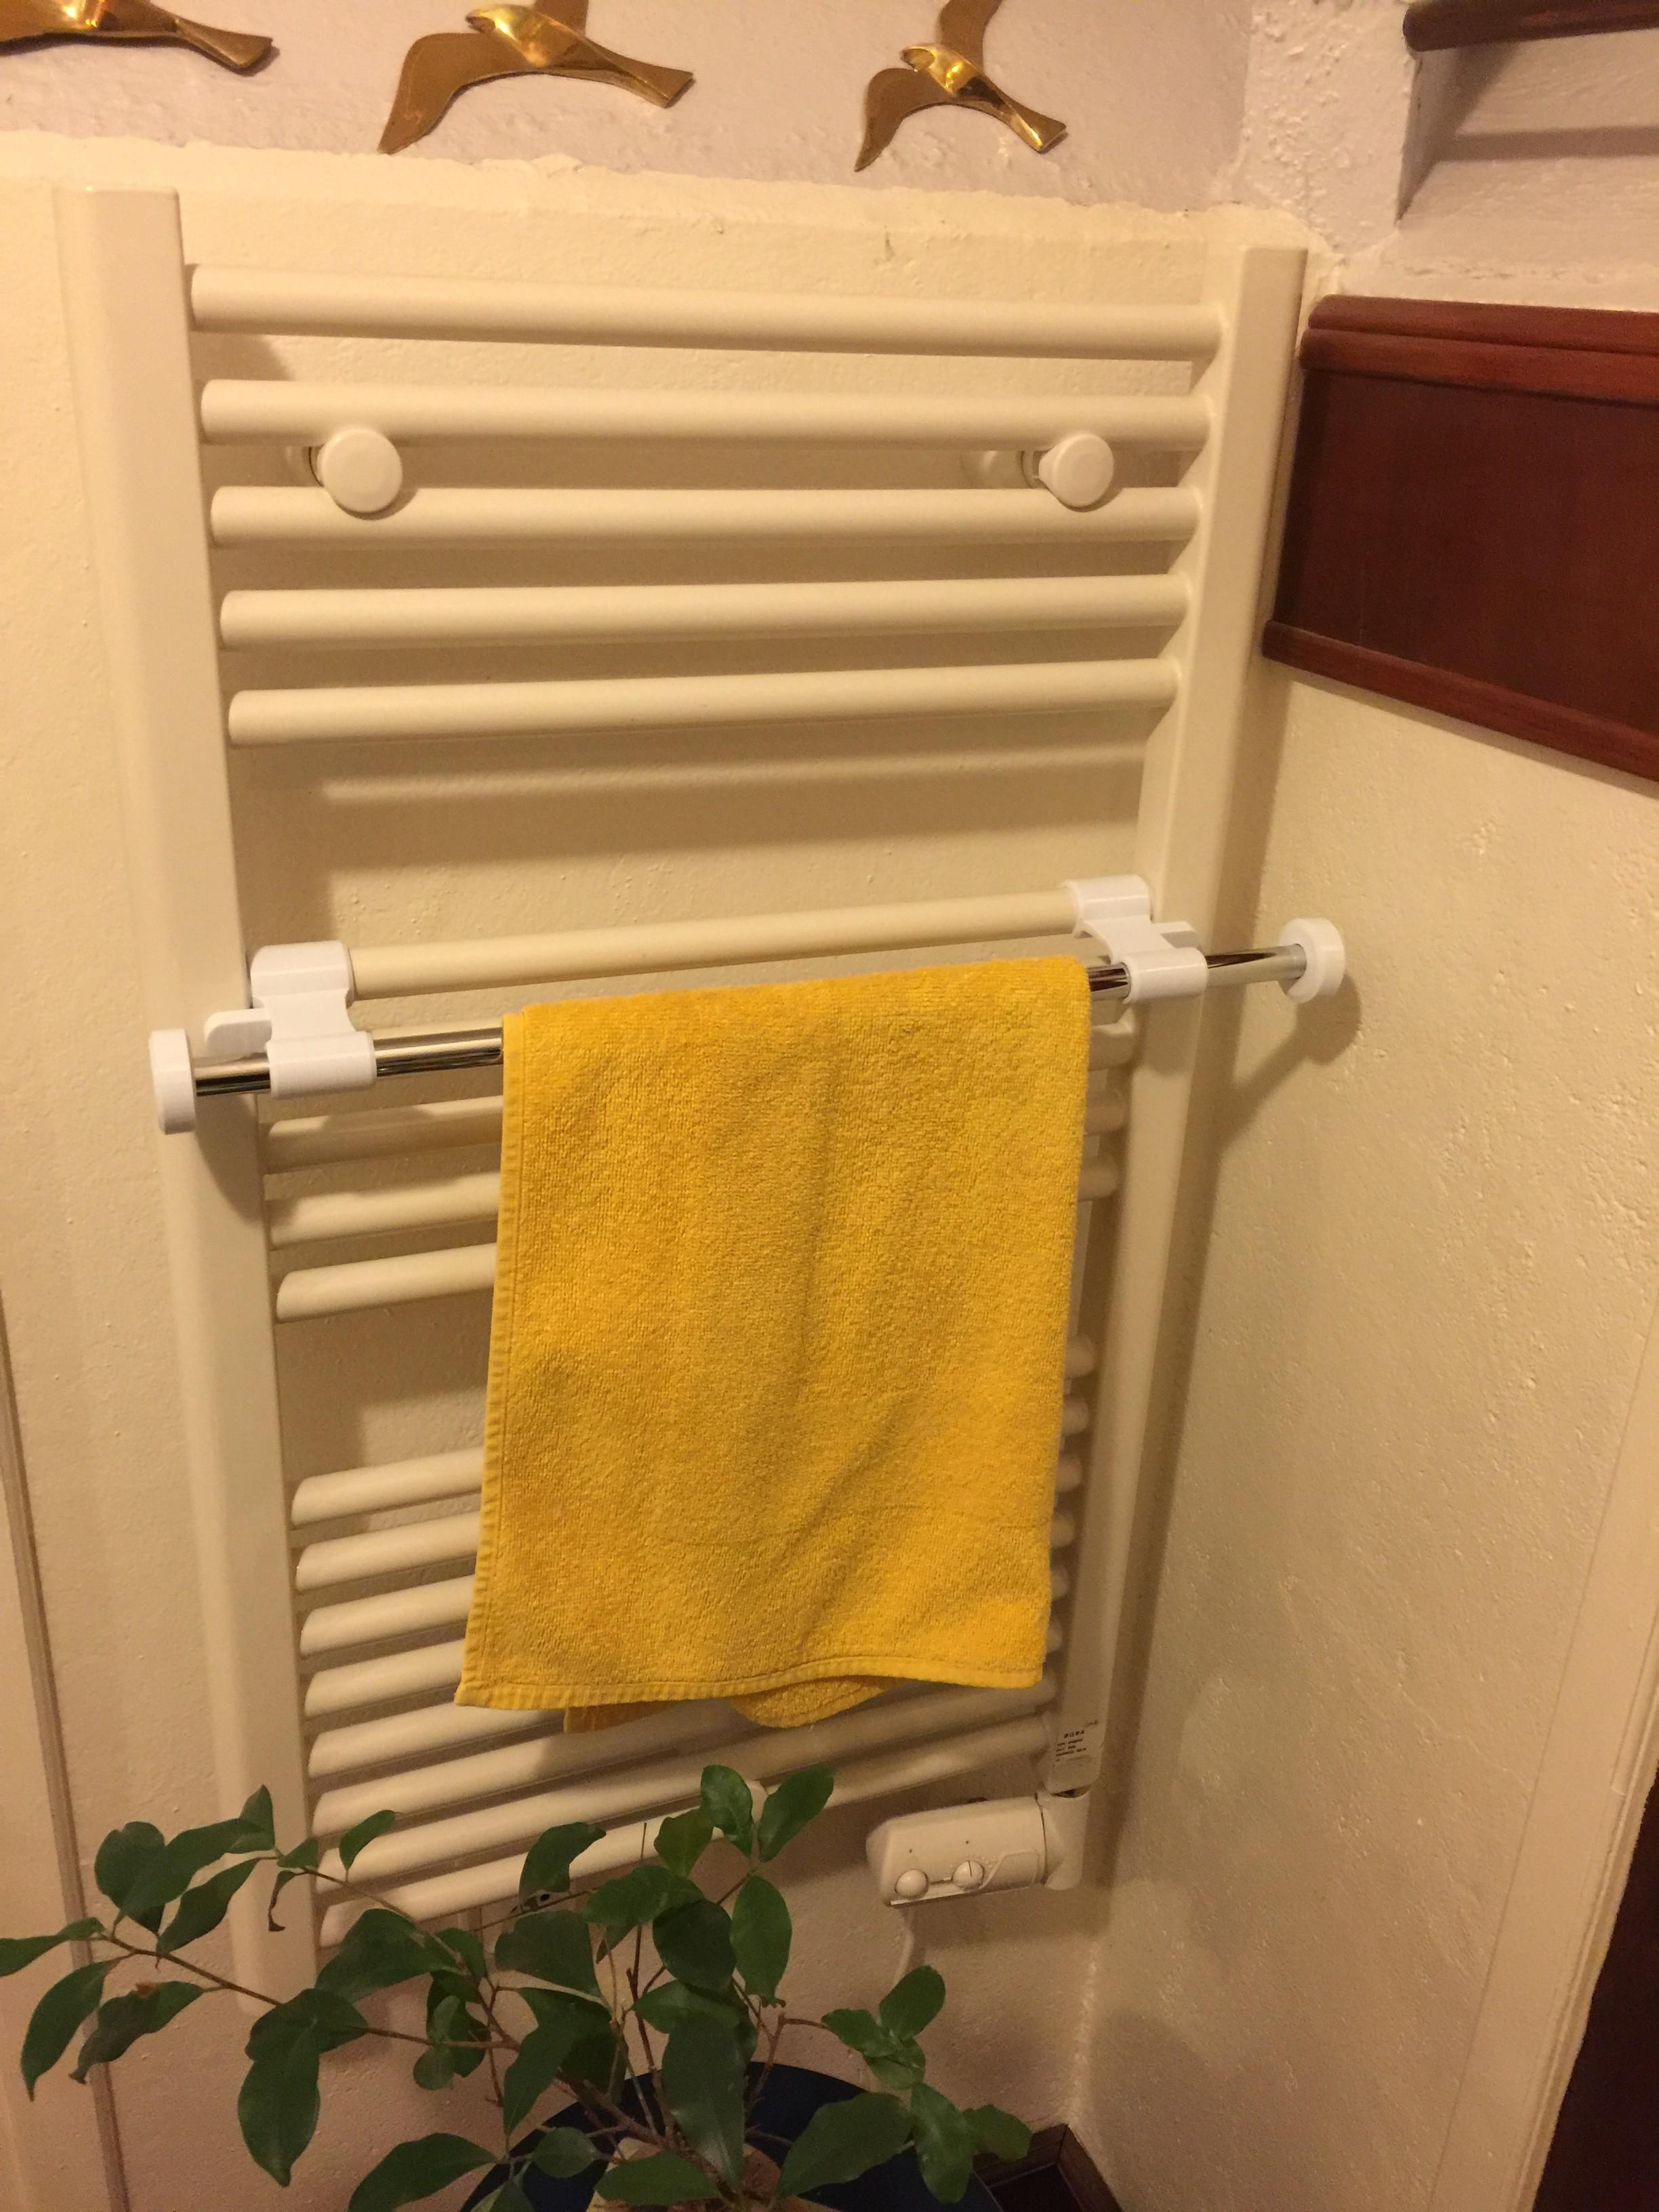 IMG_4269.JPG Download free STL file Towel dryer on radiator • Model to 3D print, domarbonne